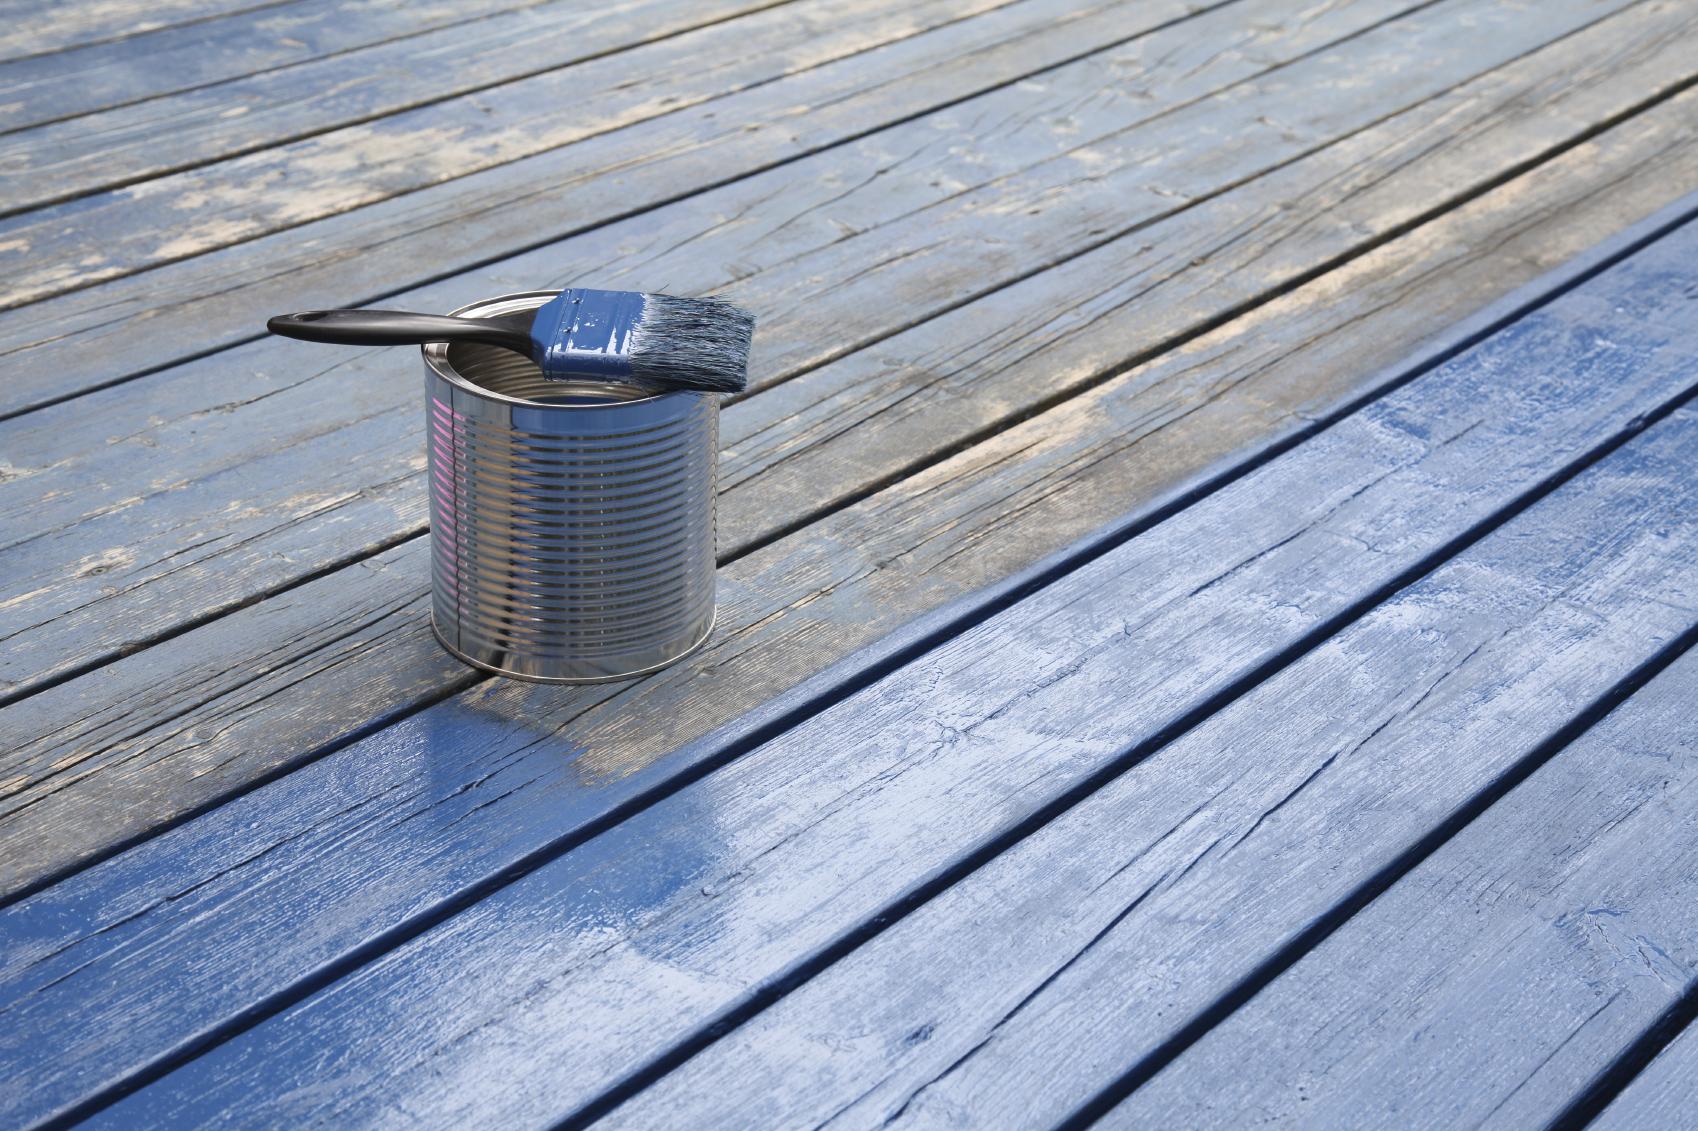 Holzfußboden Lackieren ~ Holz metalle oberflächen: so lackieren sie richtig » 11880 maler.com